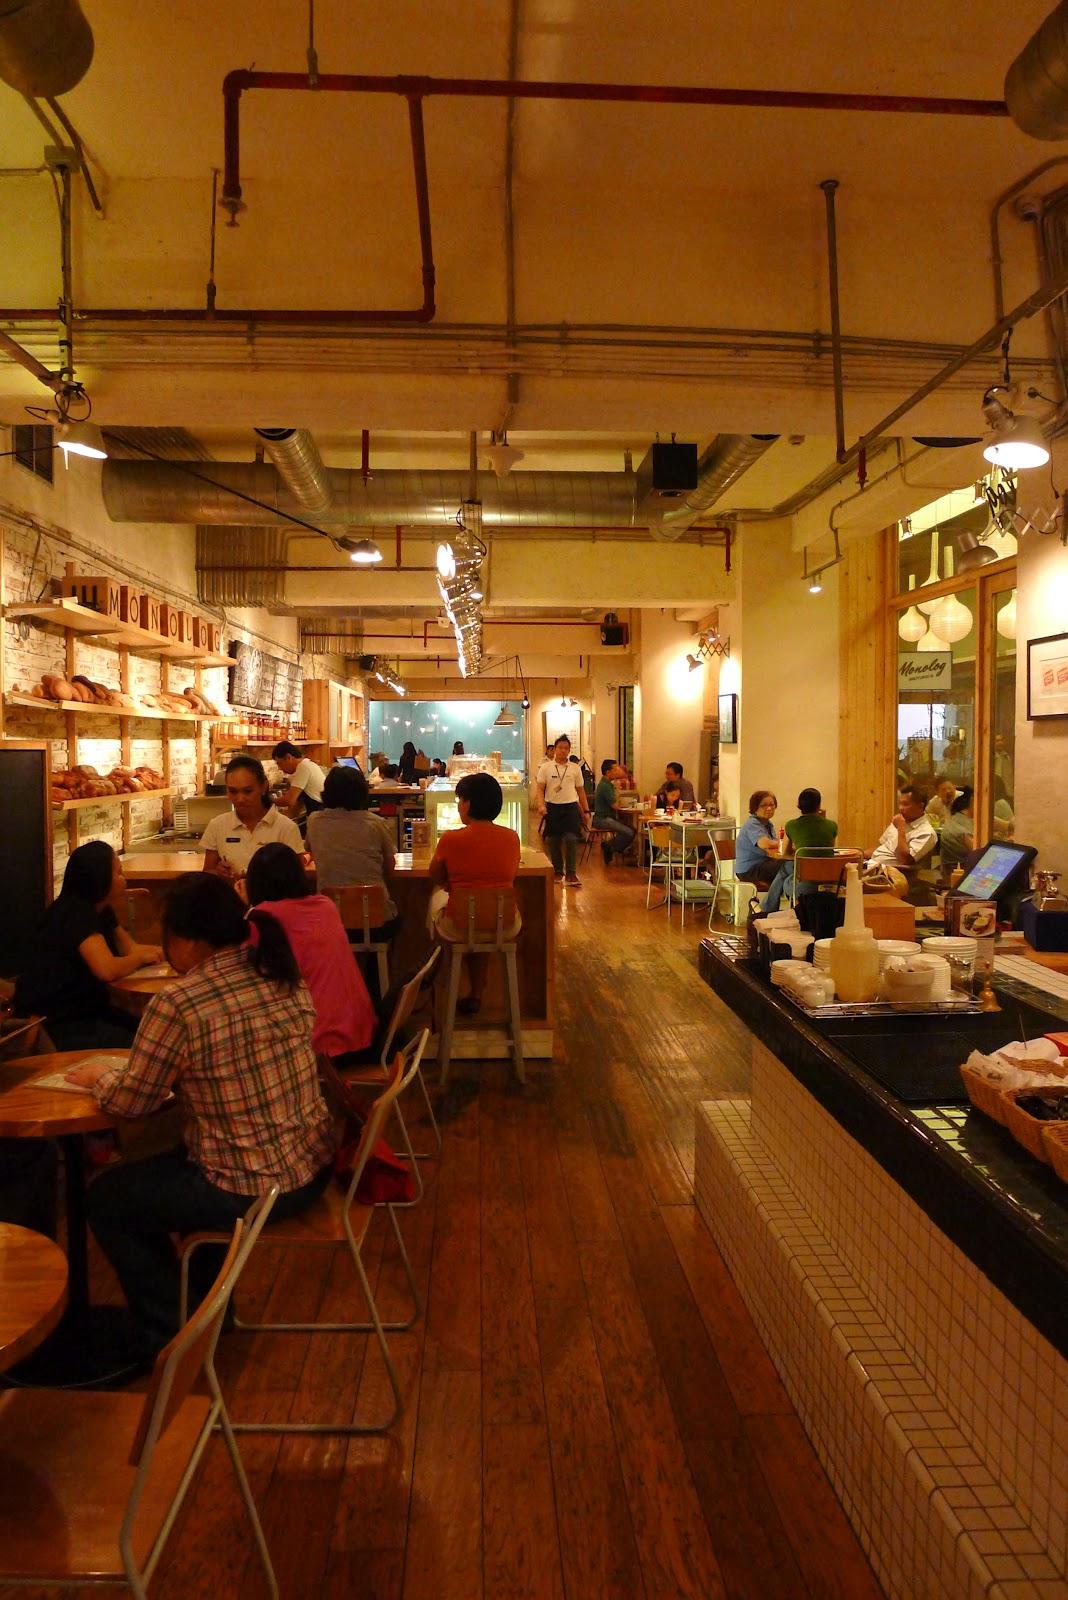 Monolog Plaza Senayan : monolog, plaza, senayan, South:, Monolog, Quality, Coffee, Plaza, Senayan,, Jakarta